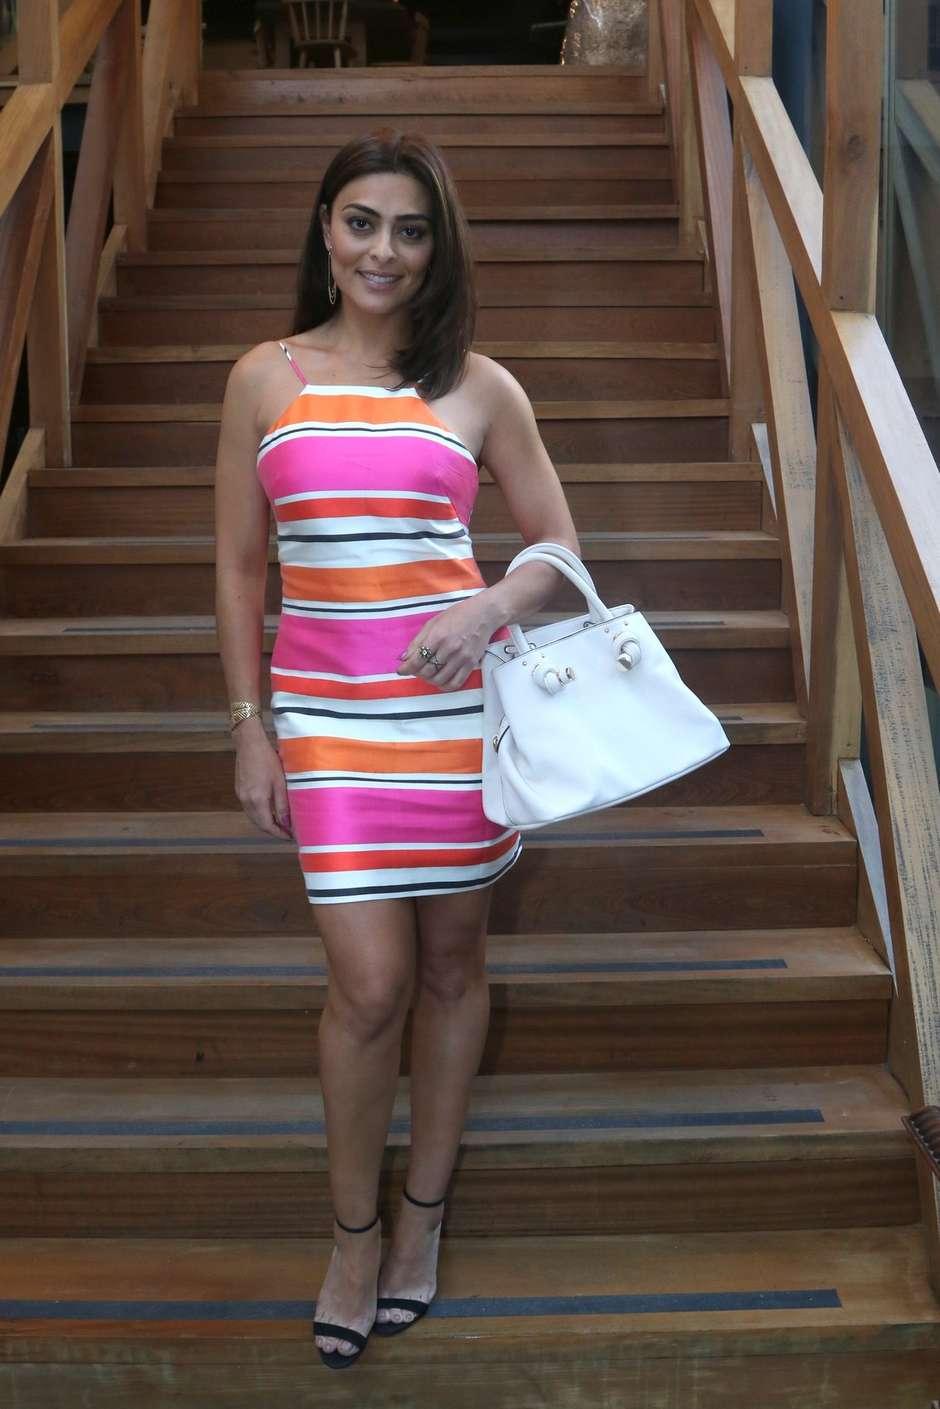 eacb8e4b59 Gafe ou fashion  Juliana Paes usa vestido curto e listrado